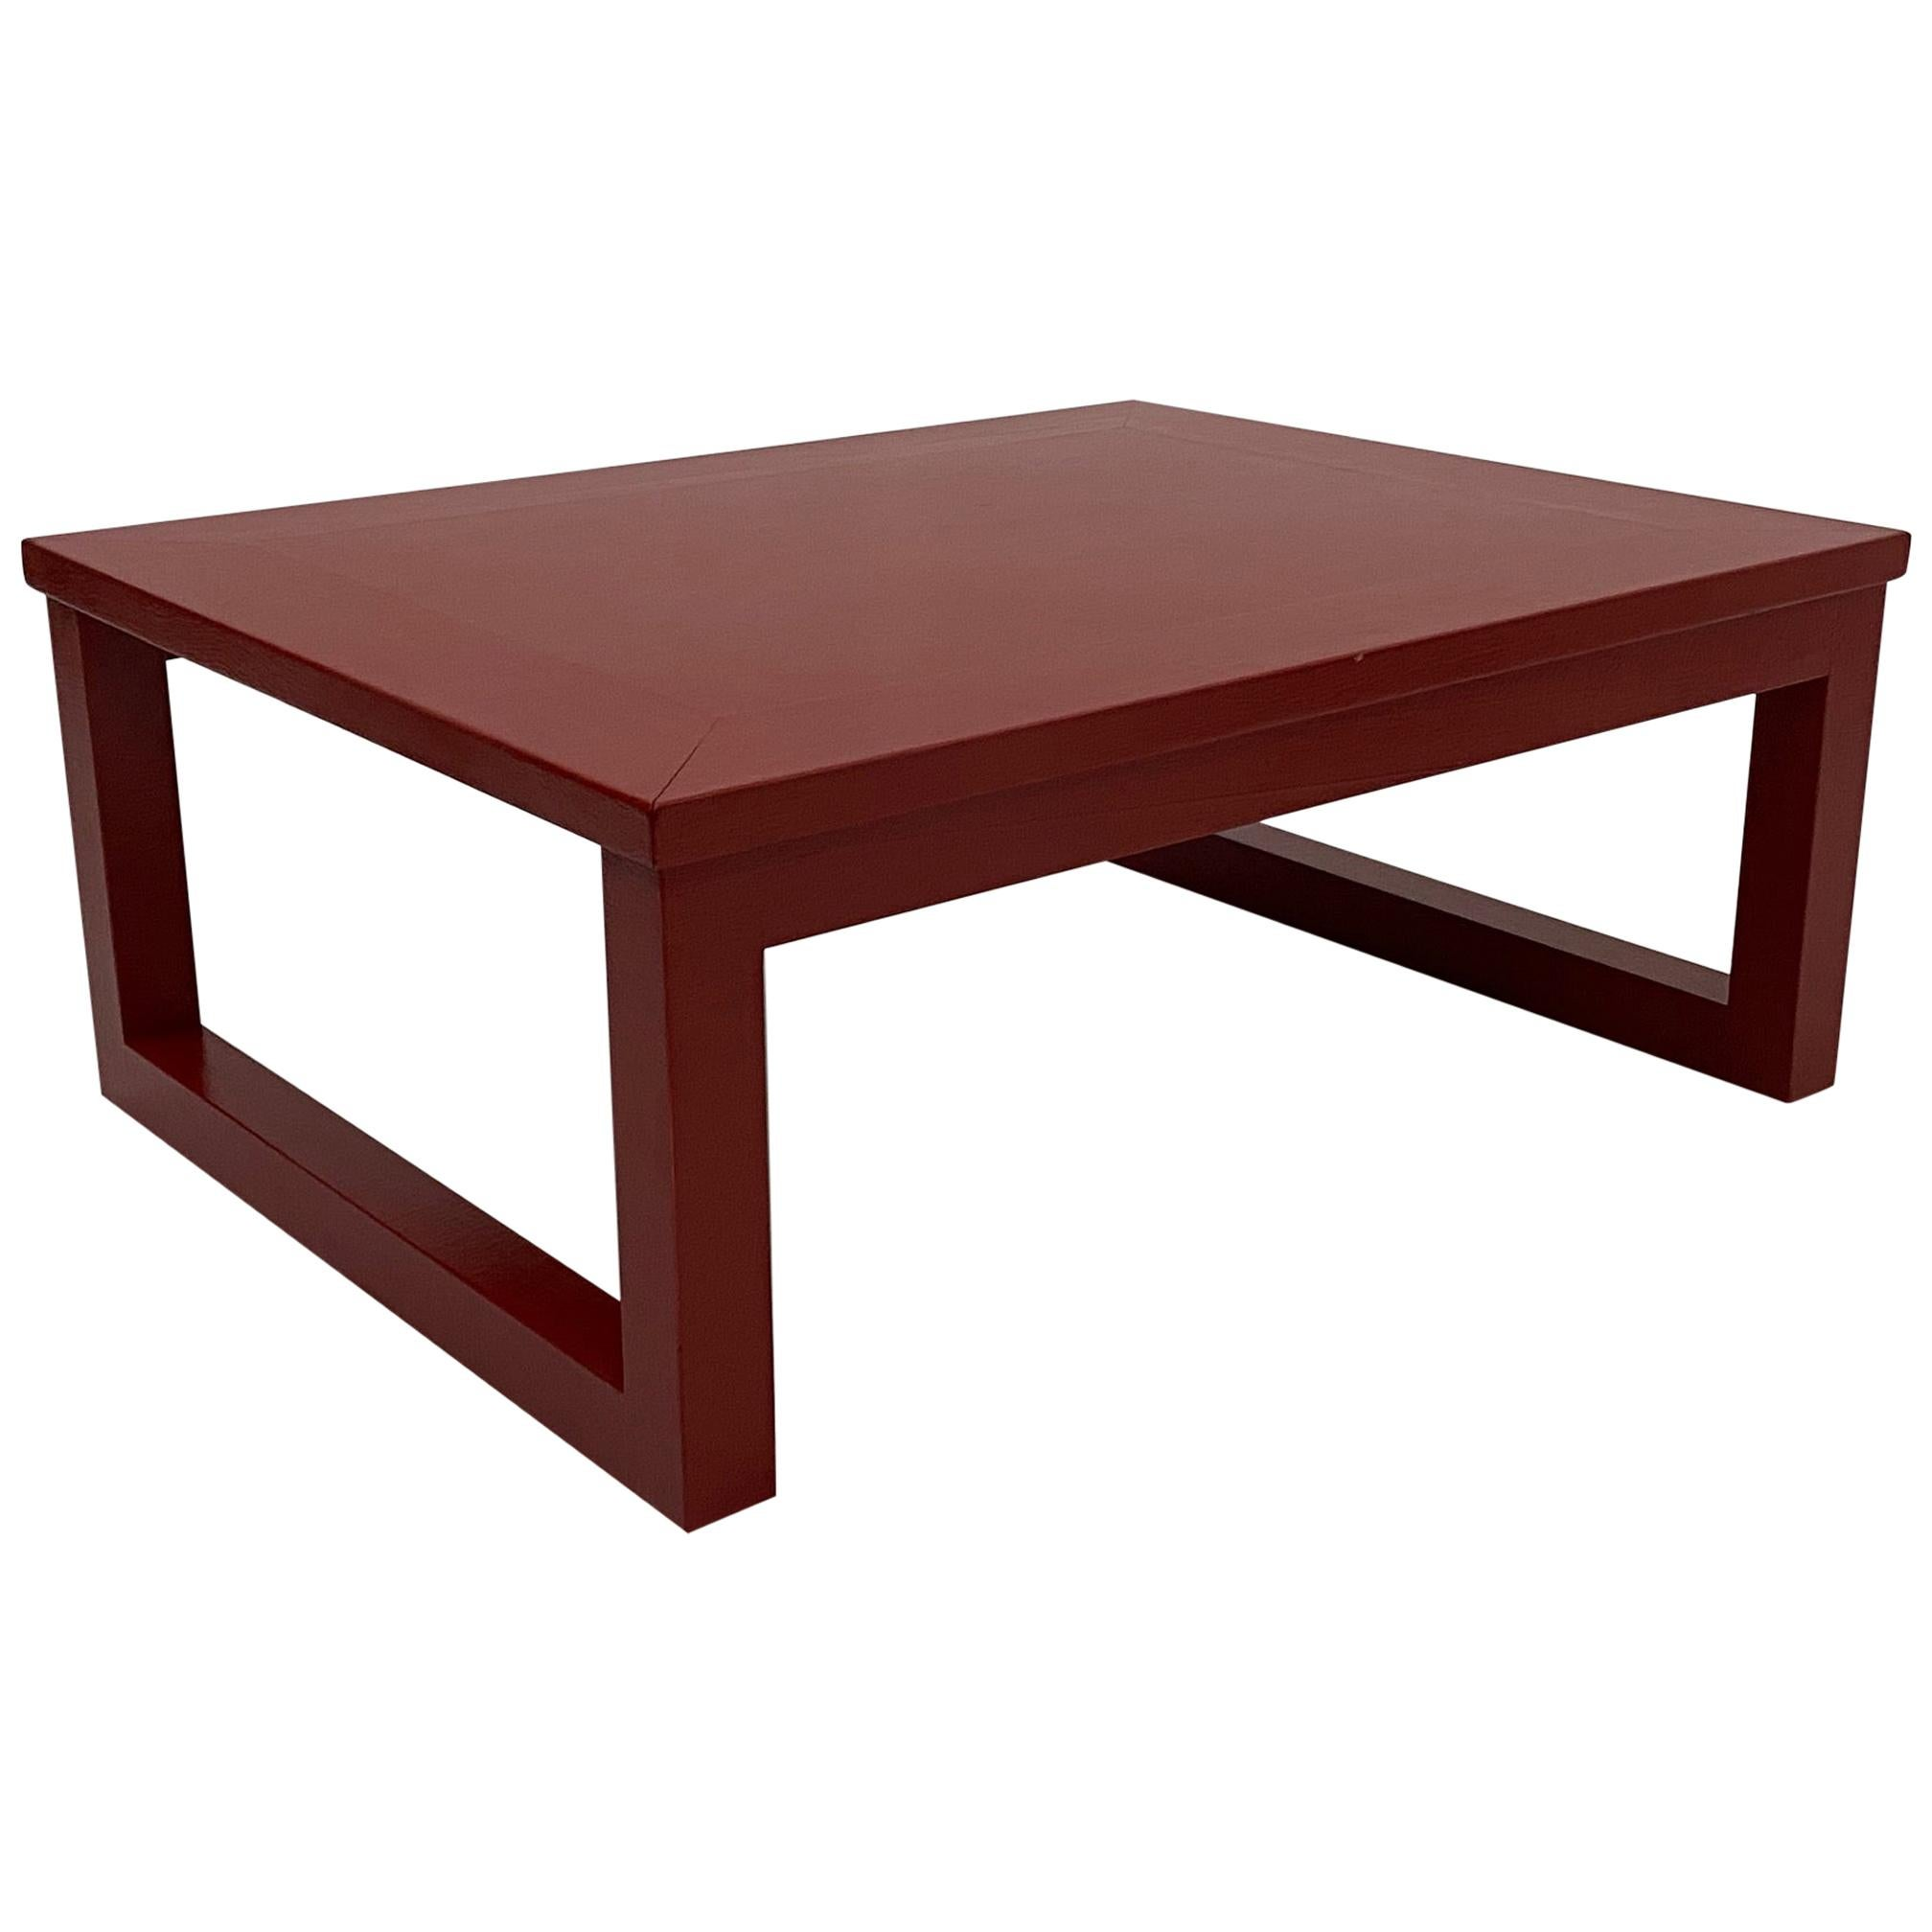 Karl Springer Cinnabar Red Grass Cloth Mid-Century Modern Coffee Table